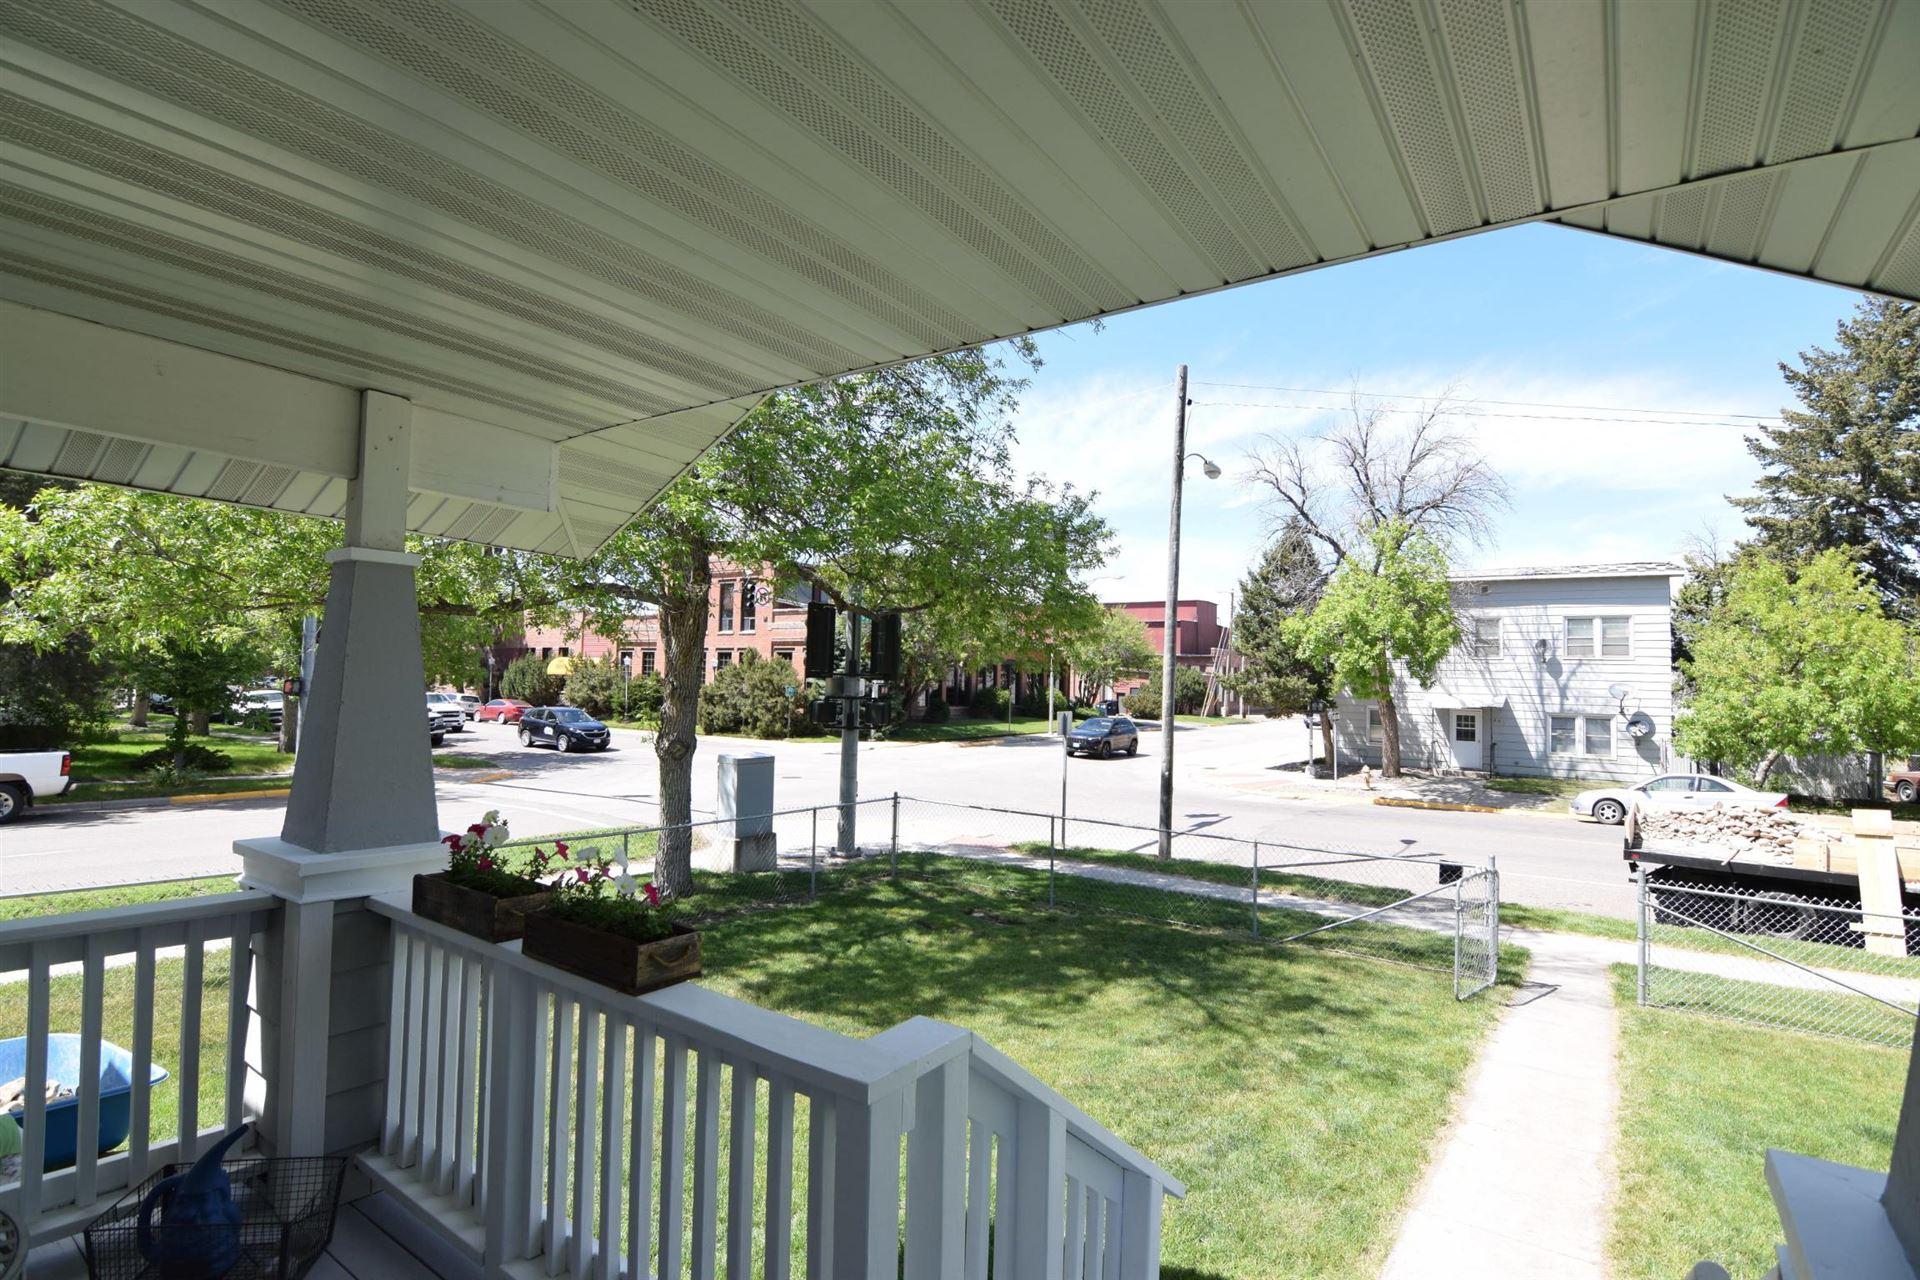 Photo of 1400 8th Avenue North, Great Falls, MT 59401 (MLS # 22108838)